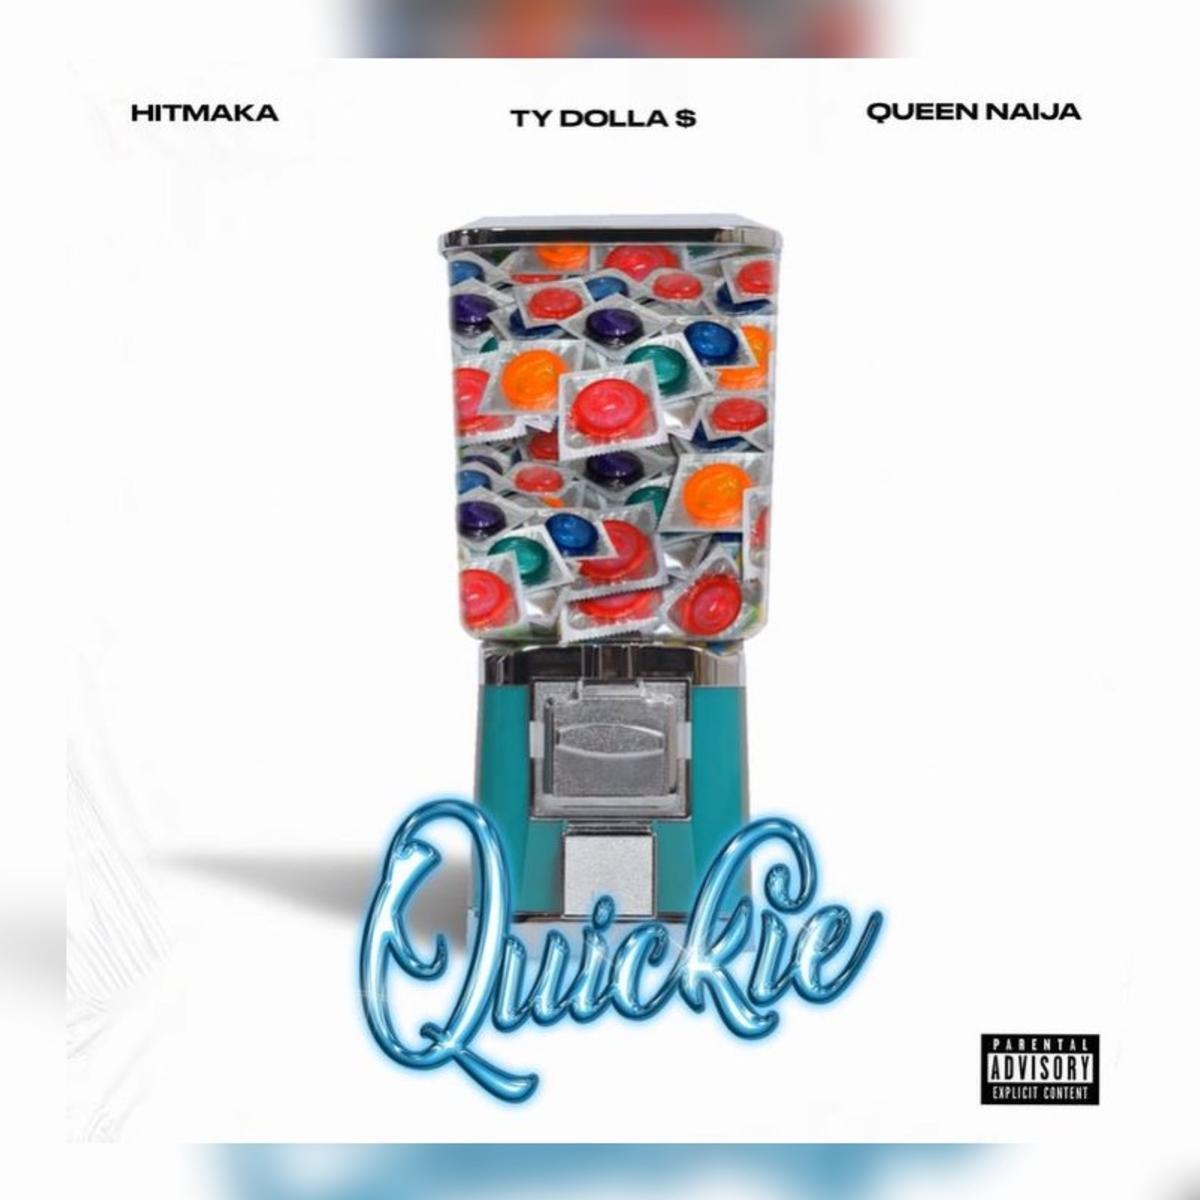 Hitmaka & Queen Naija Ft. Ty Dolla $ign - Quickie